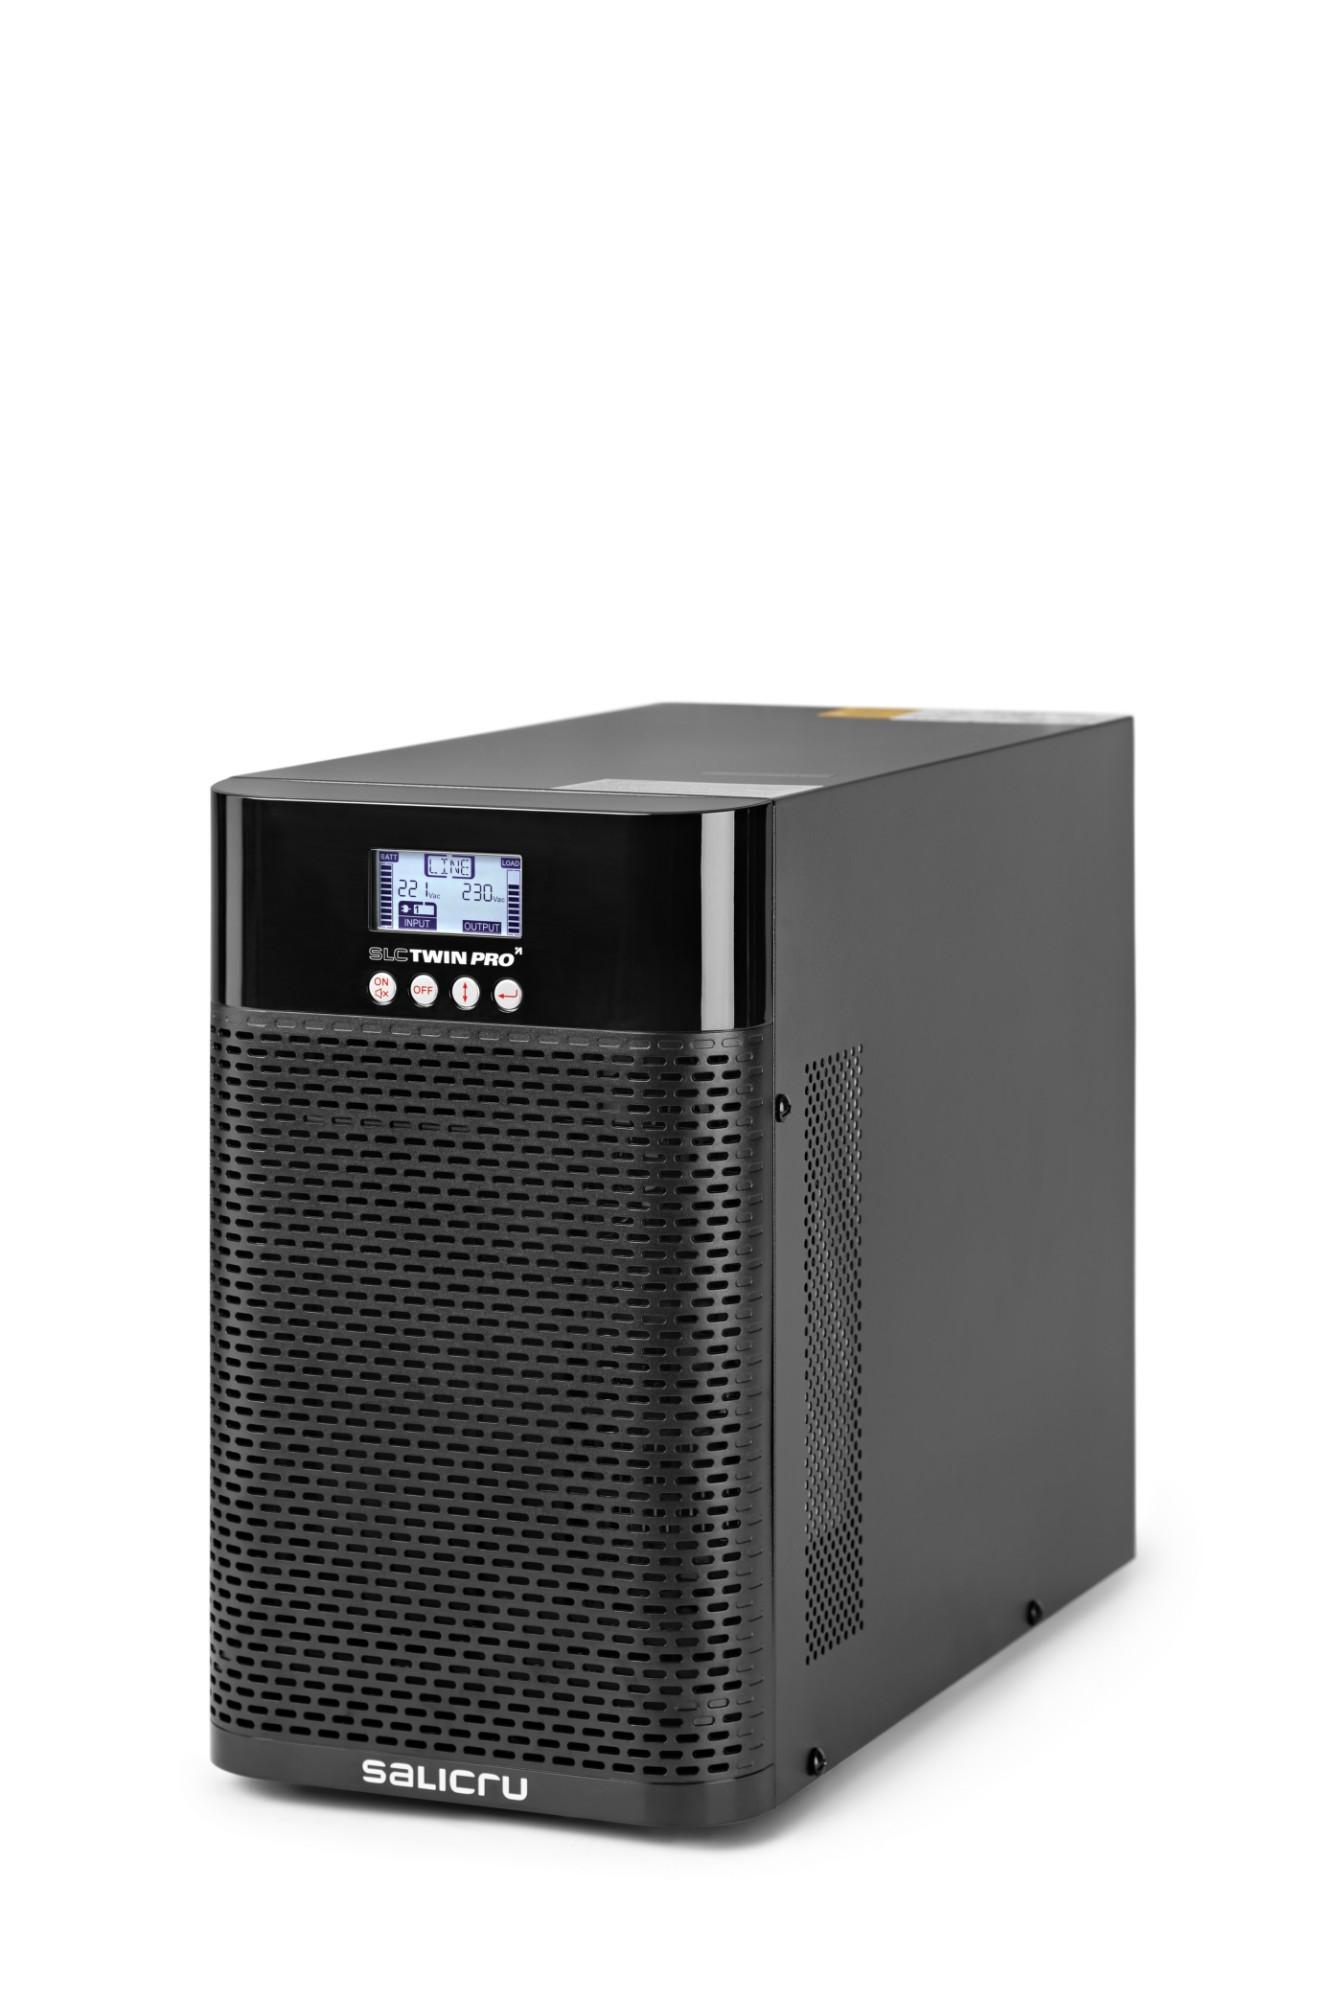 Salicru SLC 2000 TWIN PRO2 IEC SAI On-line doble conversión de 700 VA a 3000 VA